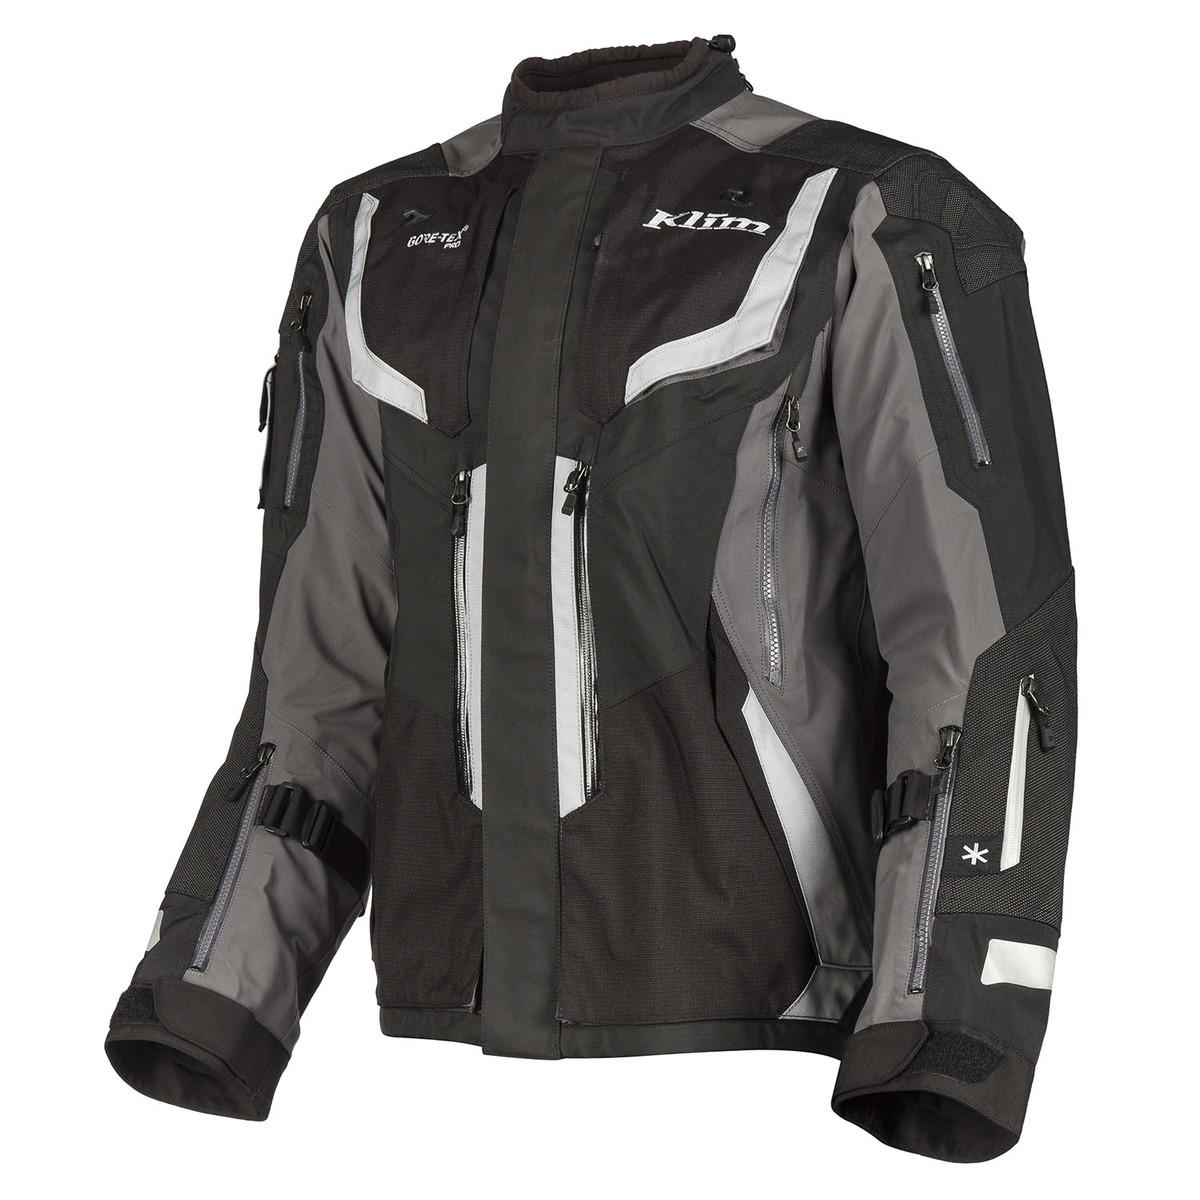 Badlands Pro Jacket Dark Gray